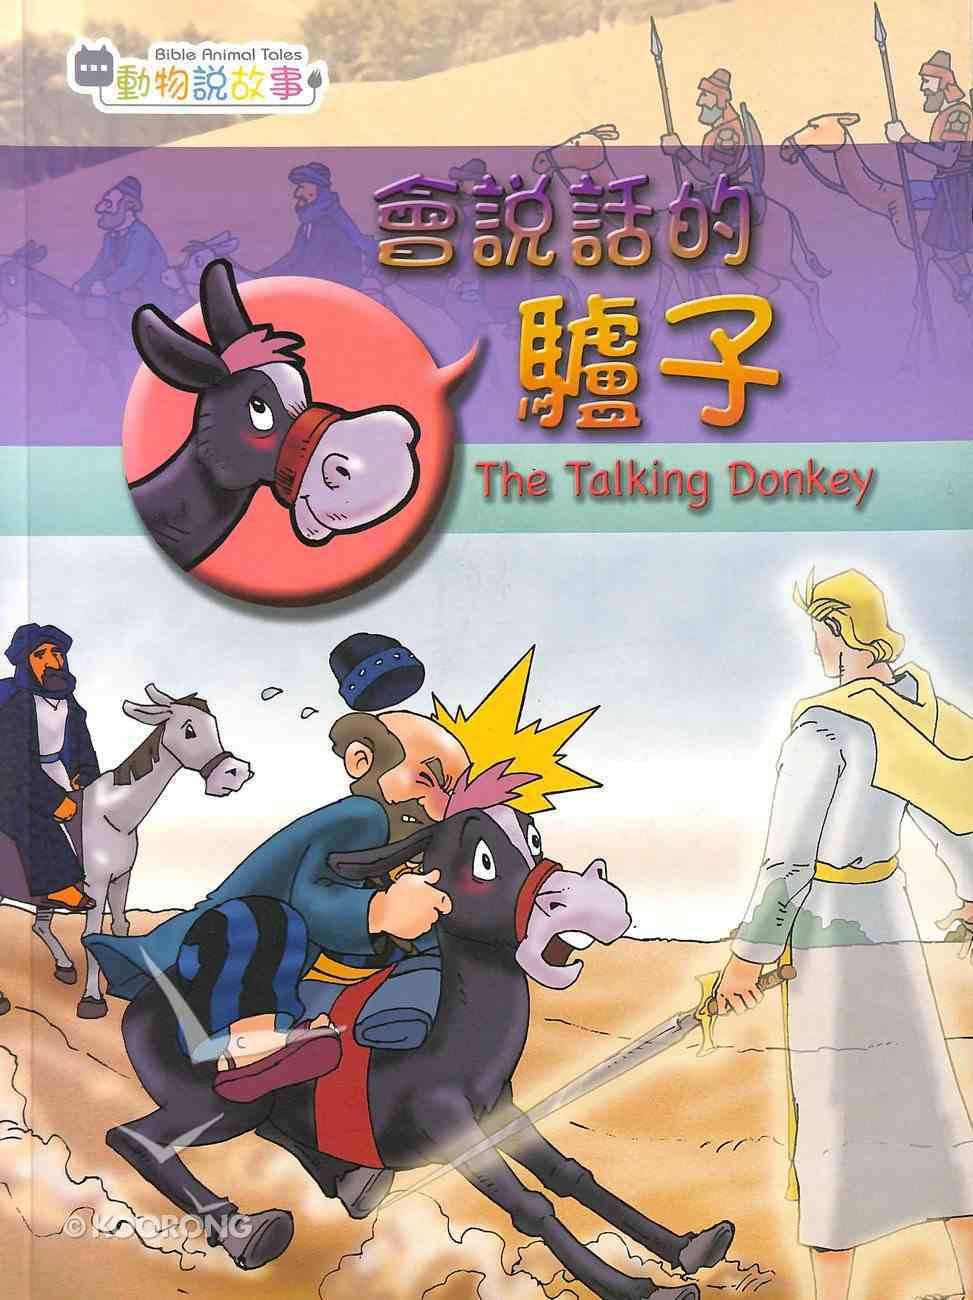 The Talking Donkey (Chinese/English) (Bible Animal Tales Series) Paperback